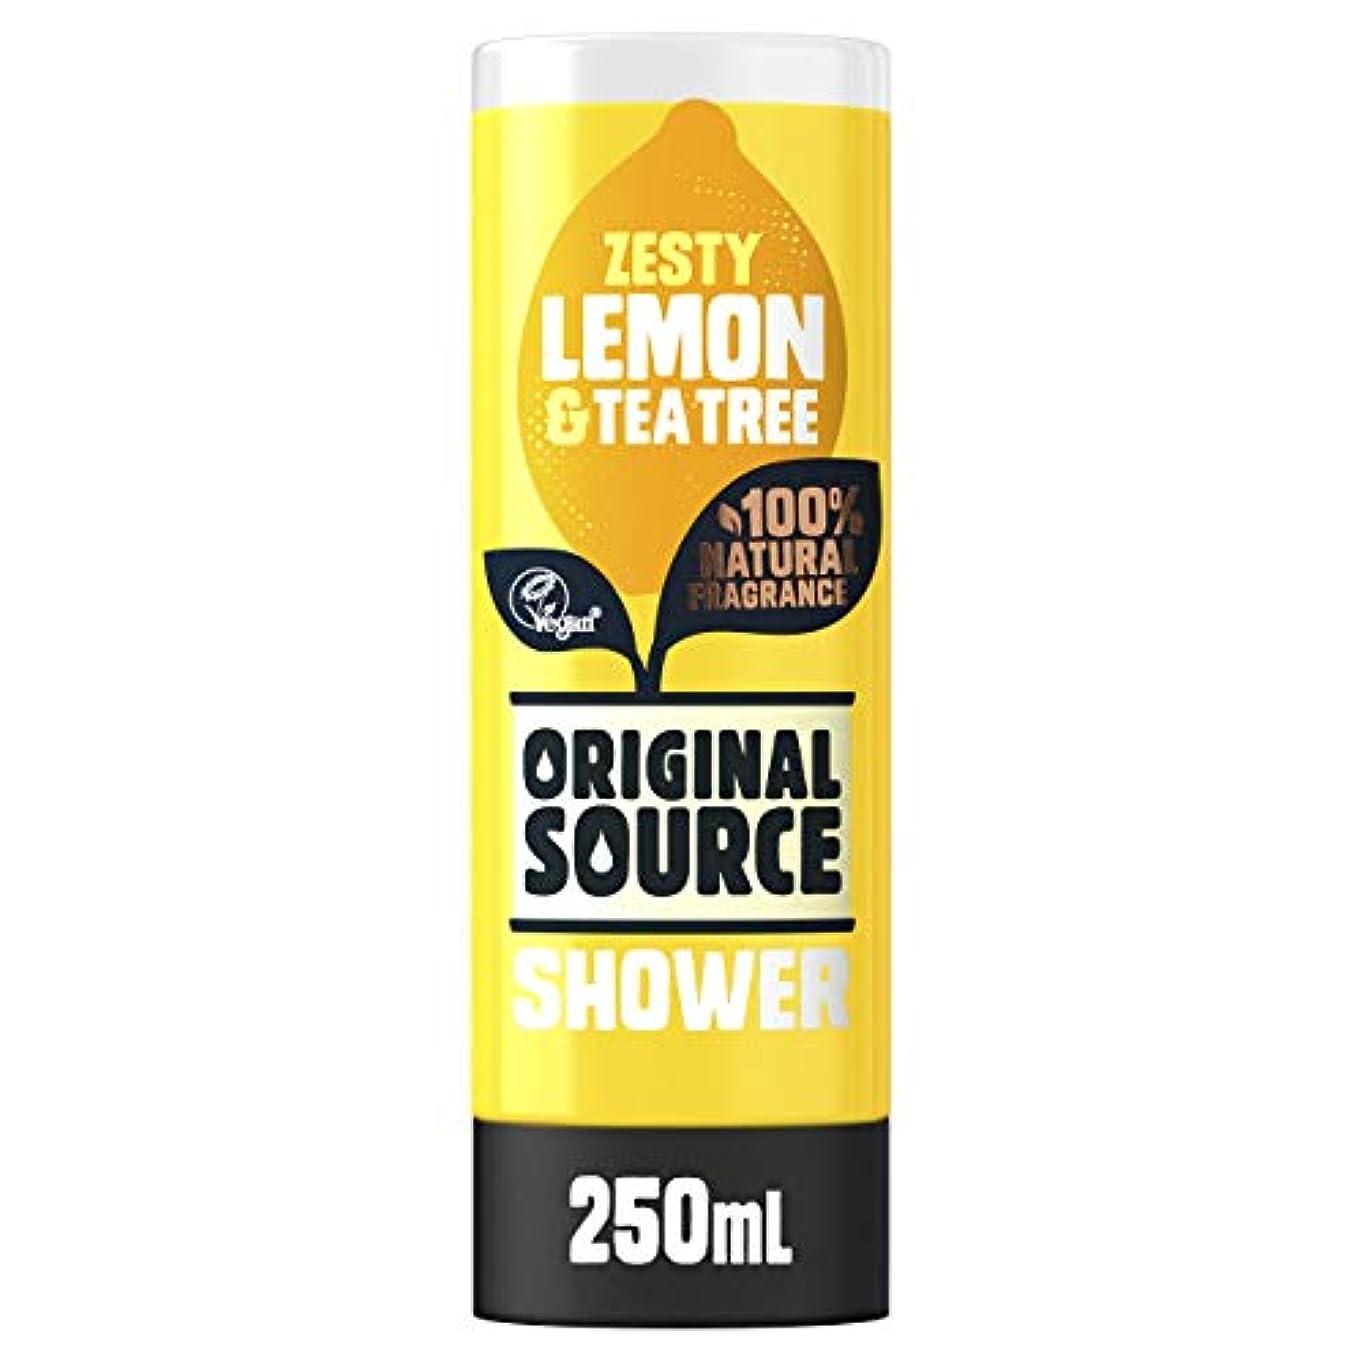 Cussons Lemon and Tea Tree Original Source Shower Gel by PZ CUSSONS (UK) LTD